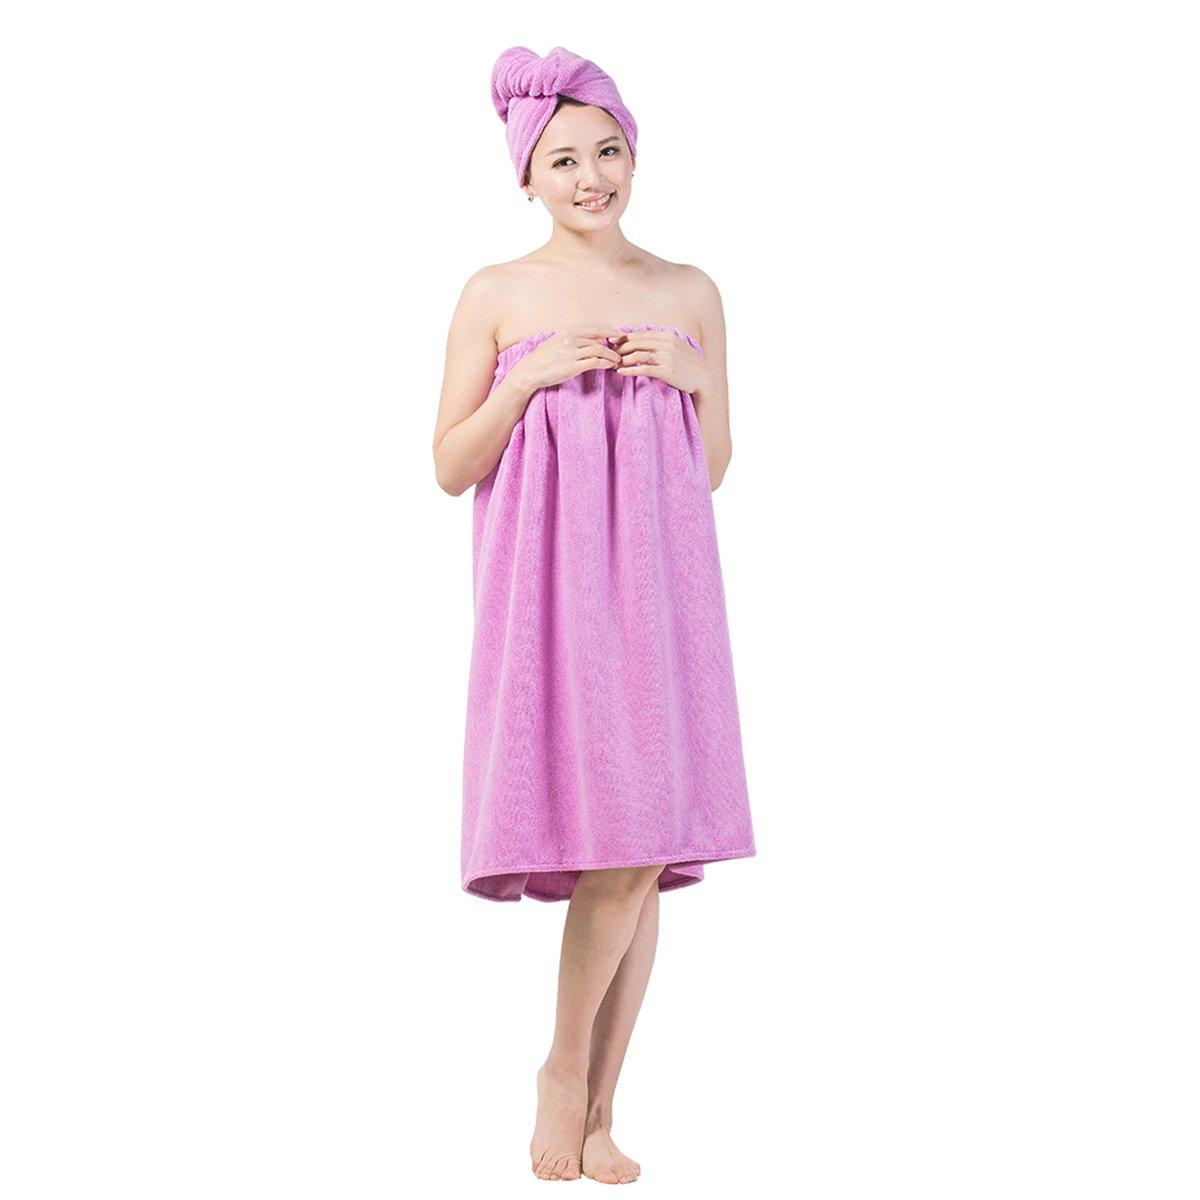 DayCount® Spa Bath Wrap Cover up Towels Set, Beach Body Wrap Washcloth Bath Skirt, Bath Spa Towel with Shower Hair Drying Turban Cap Hat for Women Girls and Men (Purple, XL: 59'' x 35.43'') DC2242